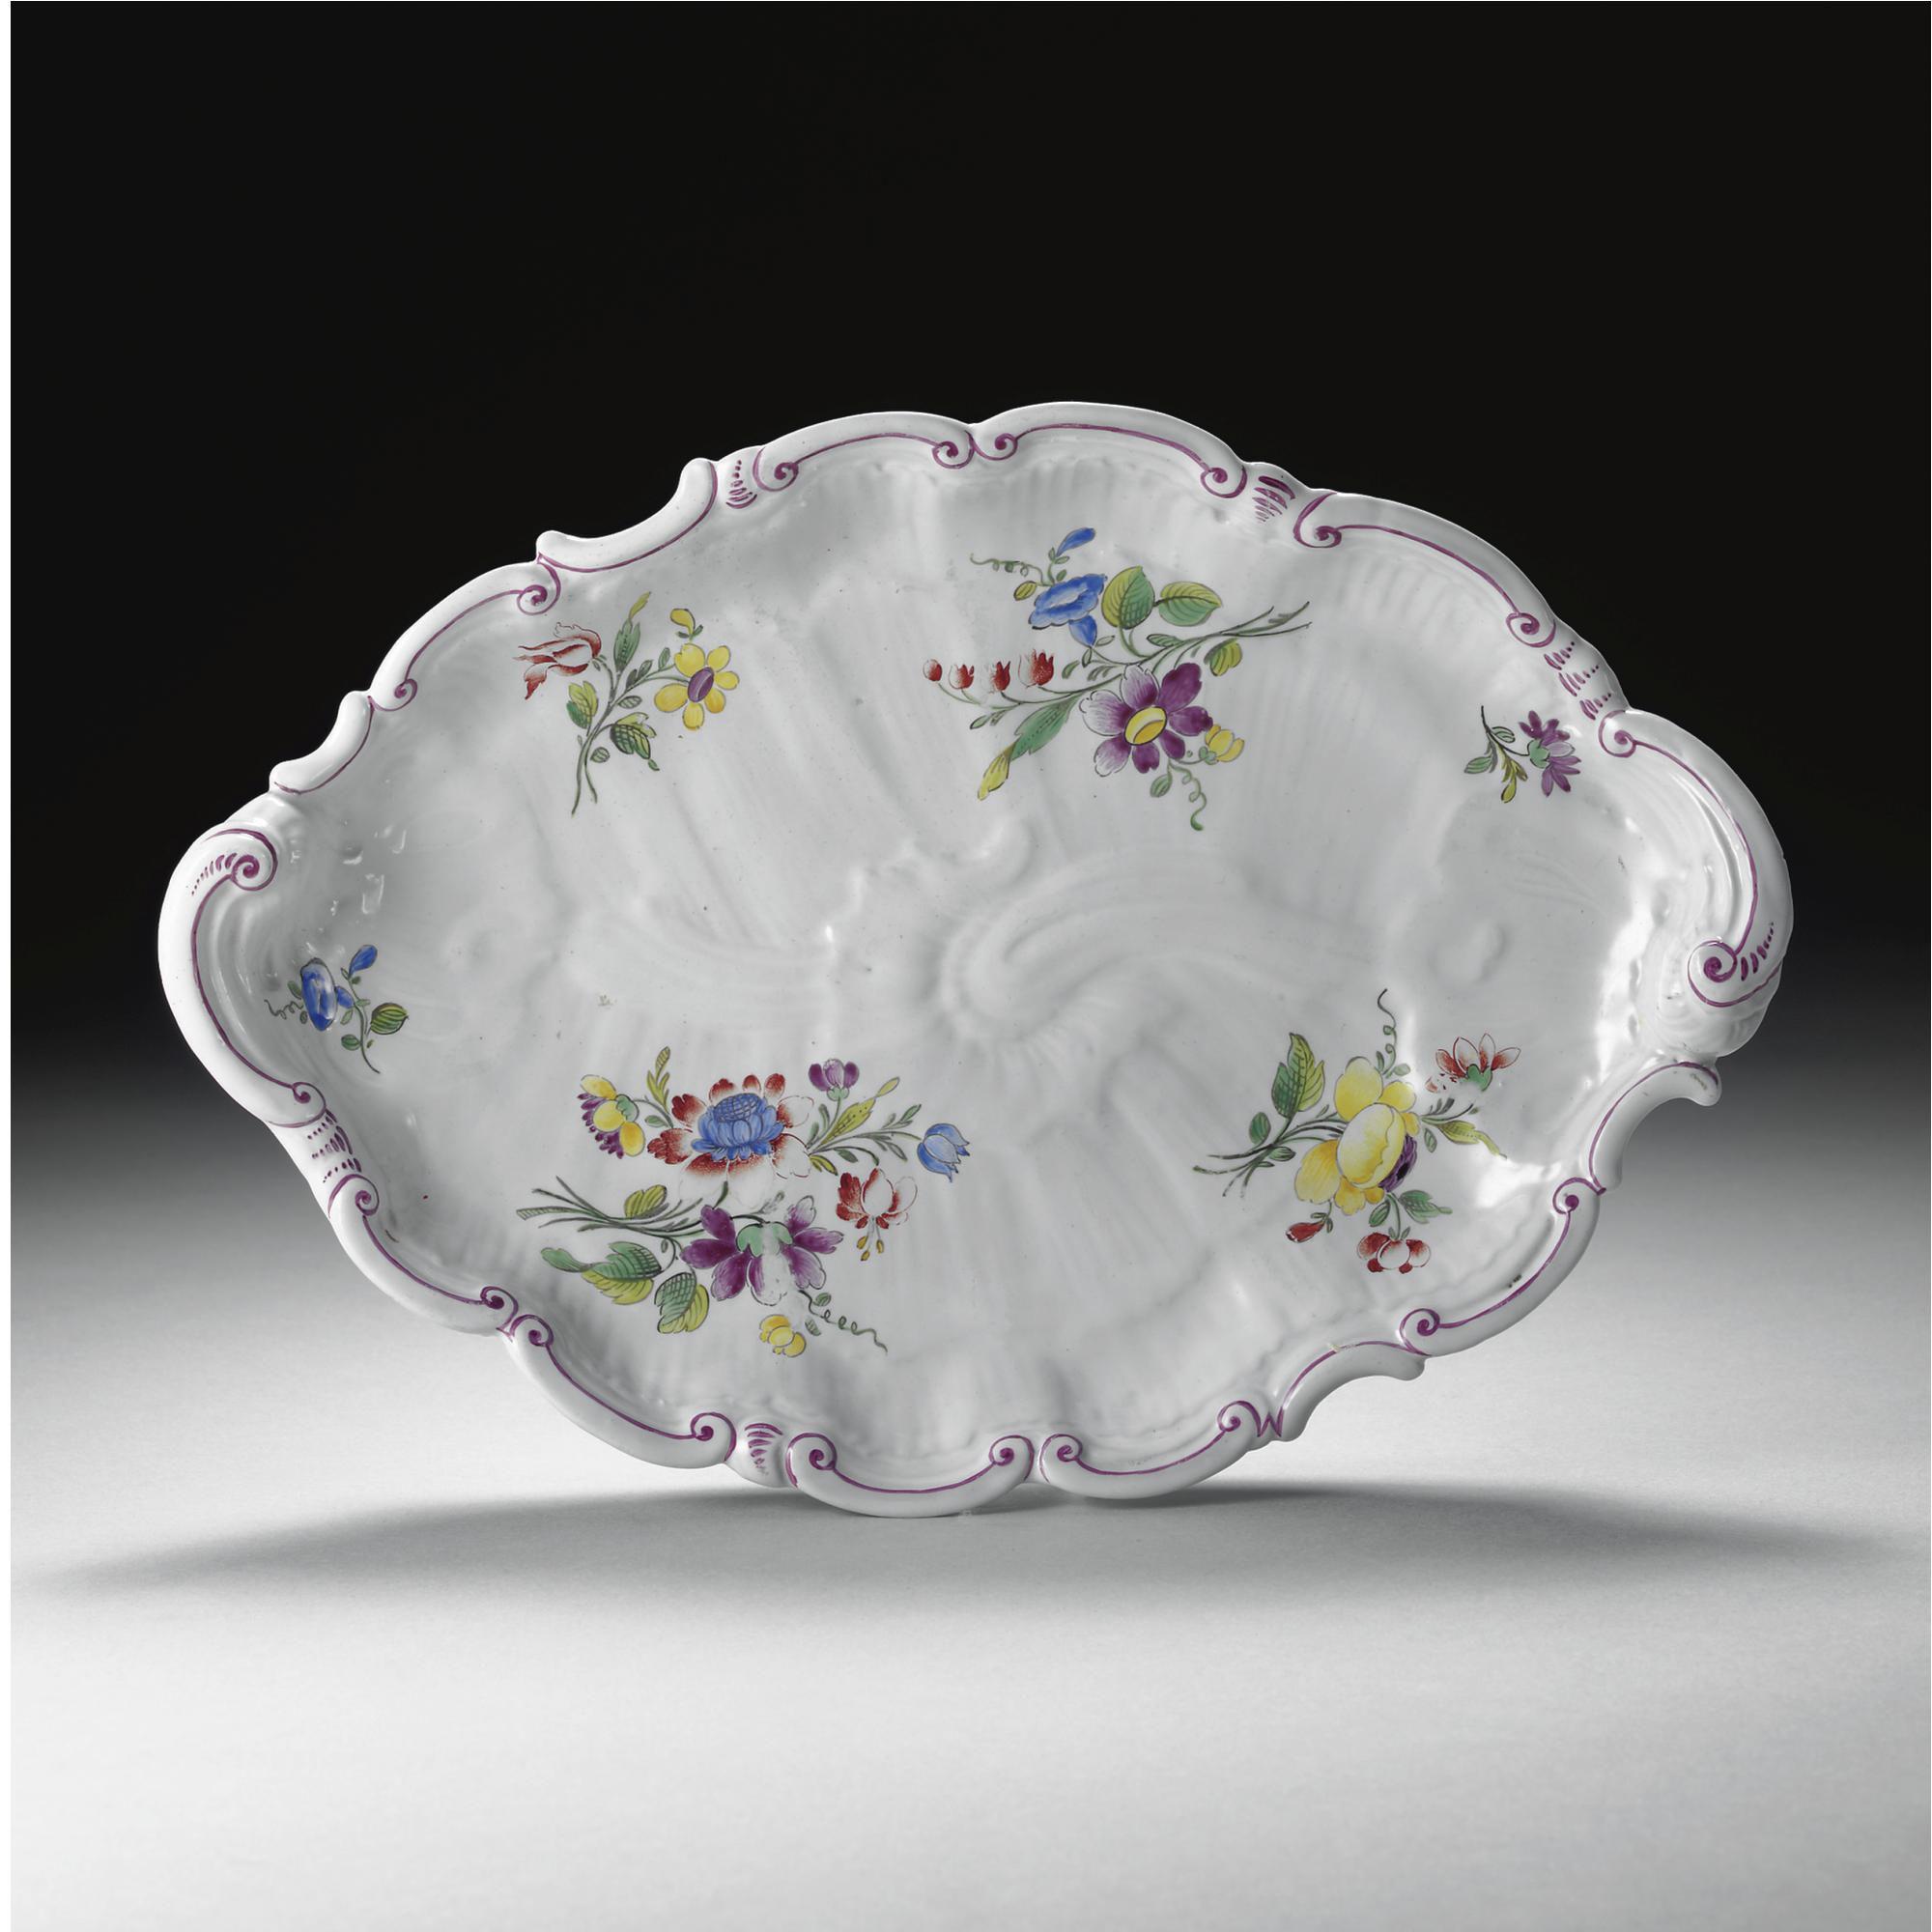 A Doccia Porcelain Dish Circa 1770 Doccia Porcellana